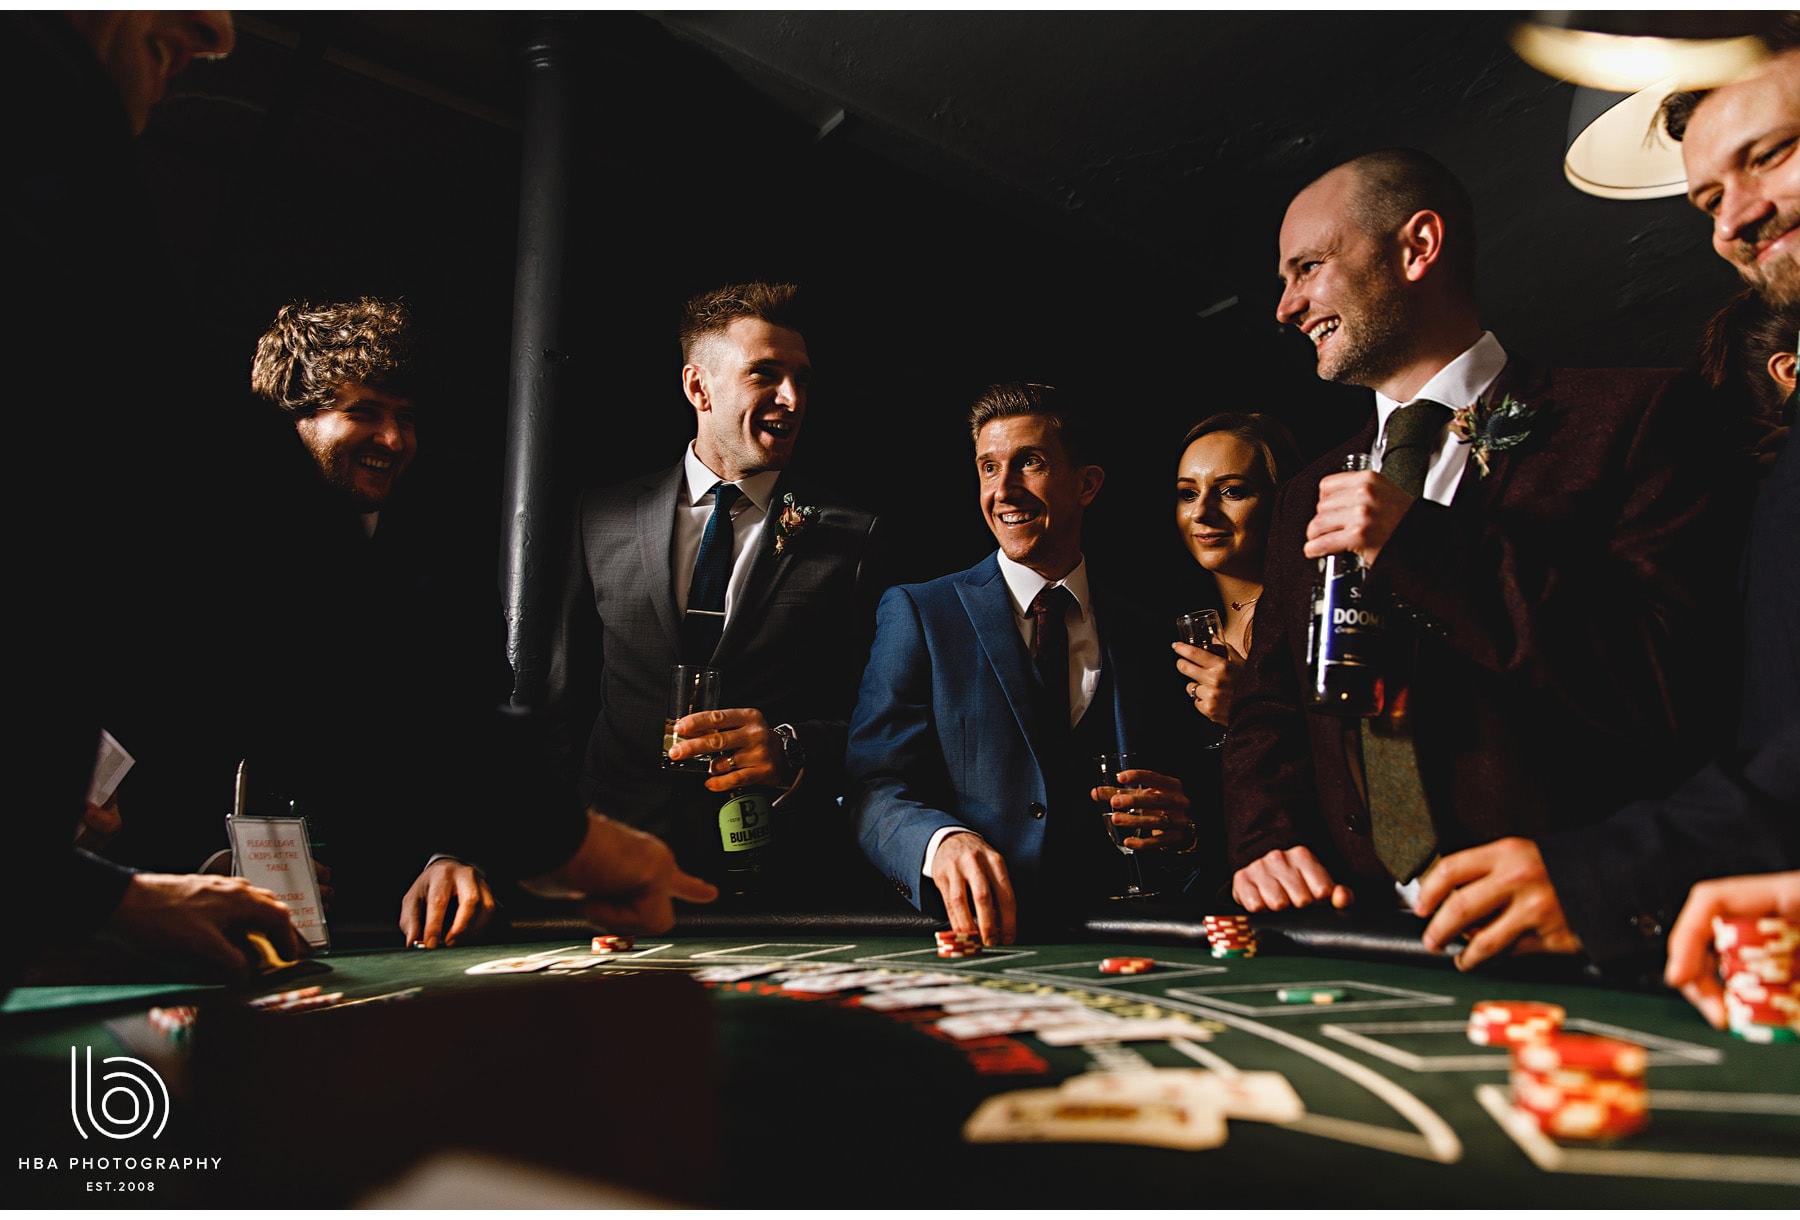 guests playing blackjack